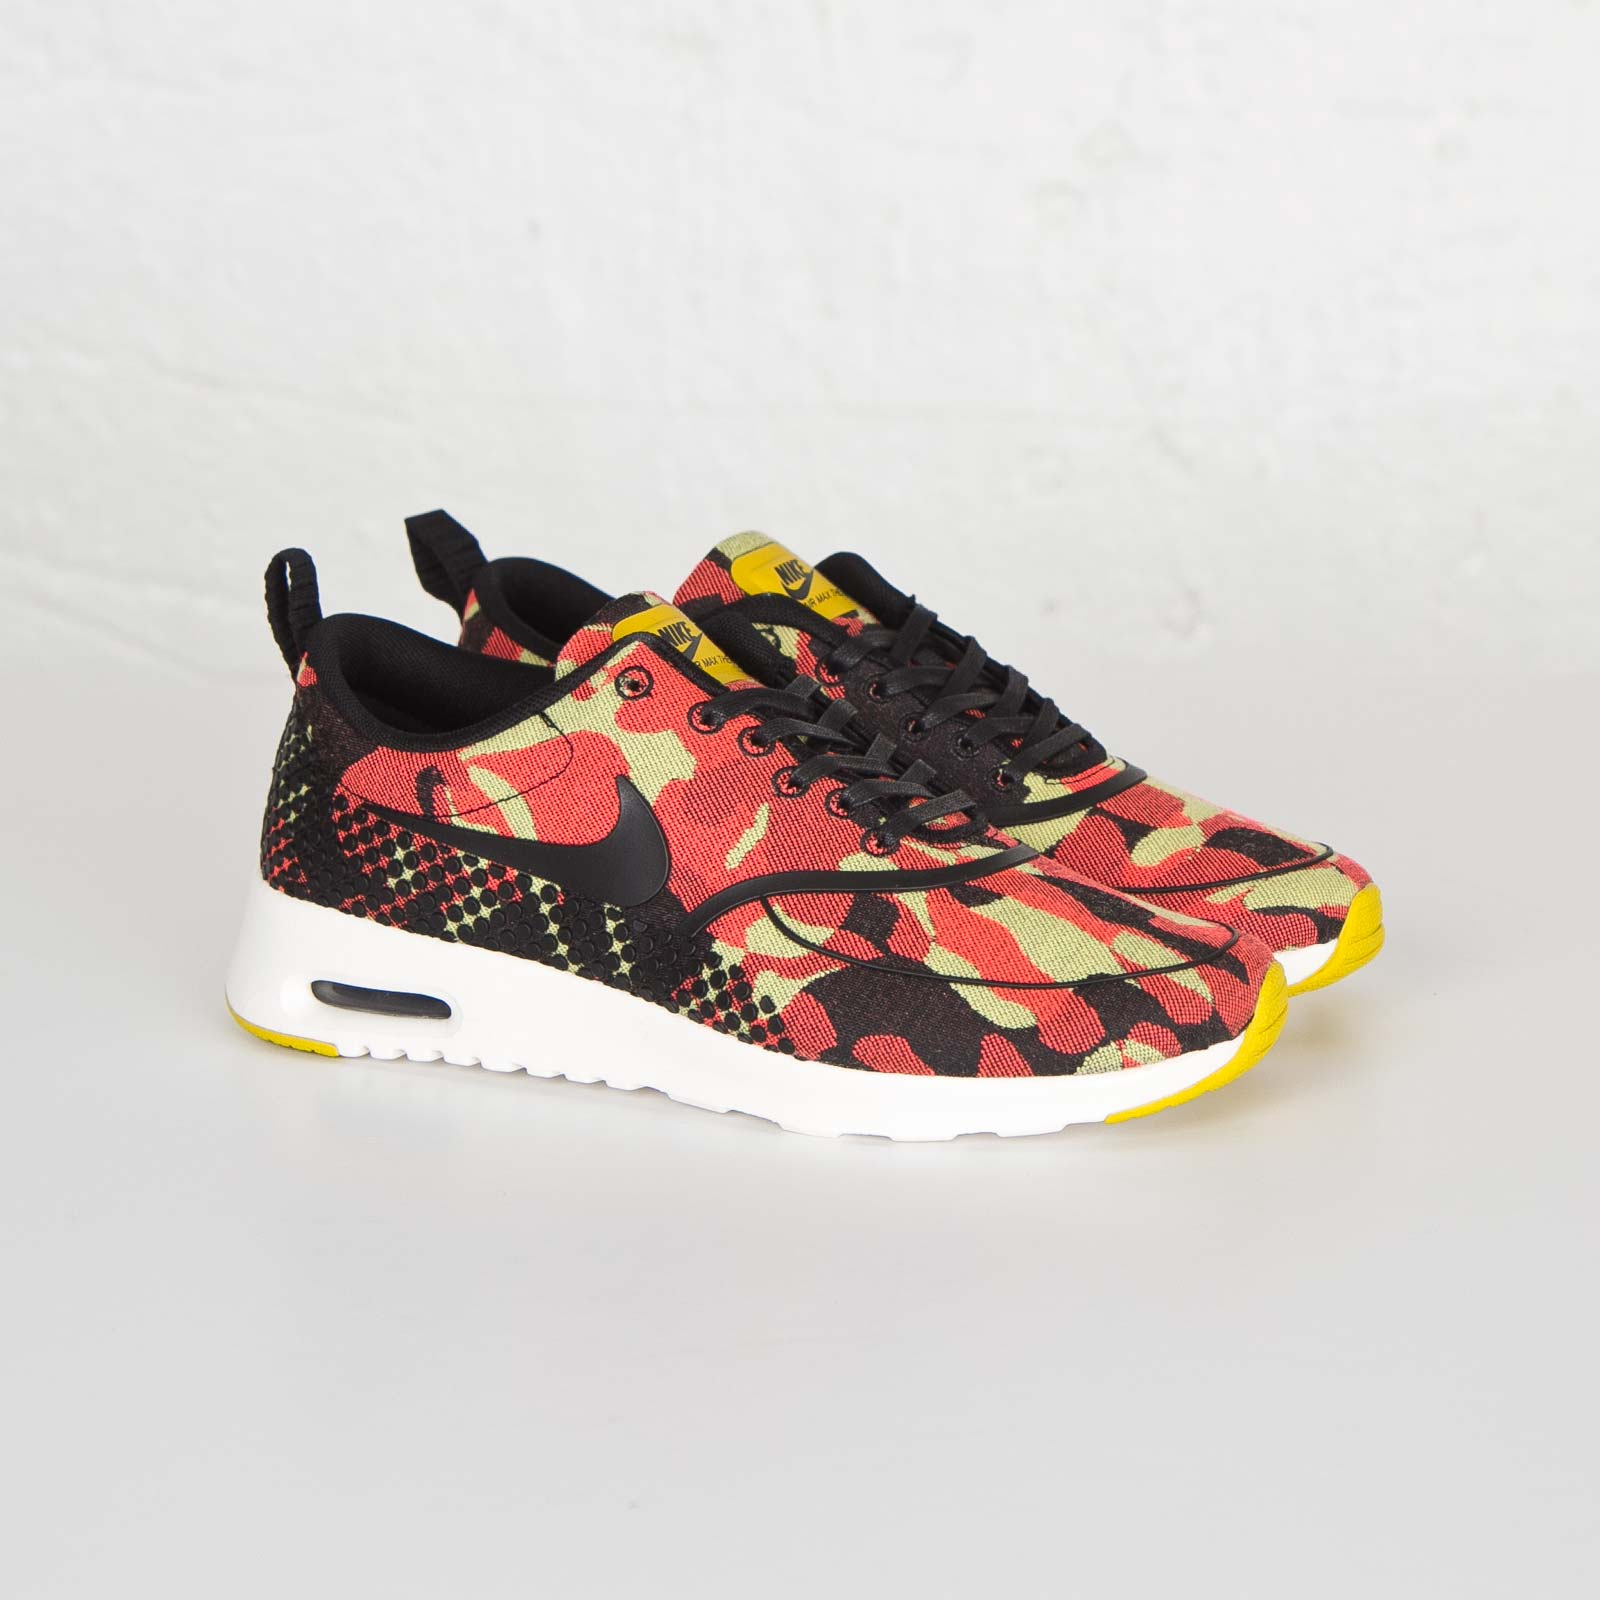 Nike Air Max Thea Jacquard Premium